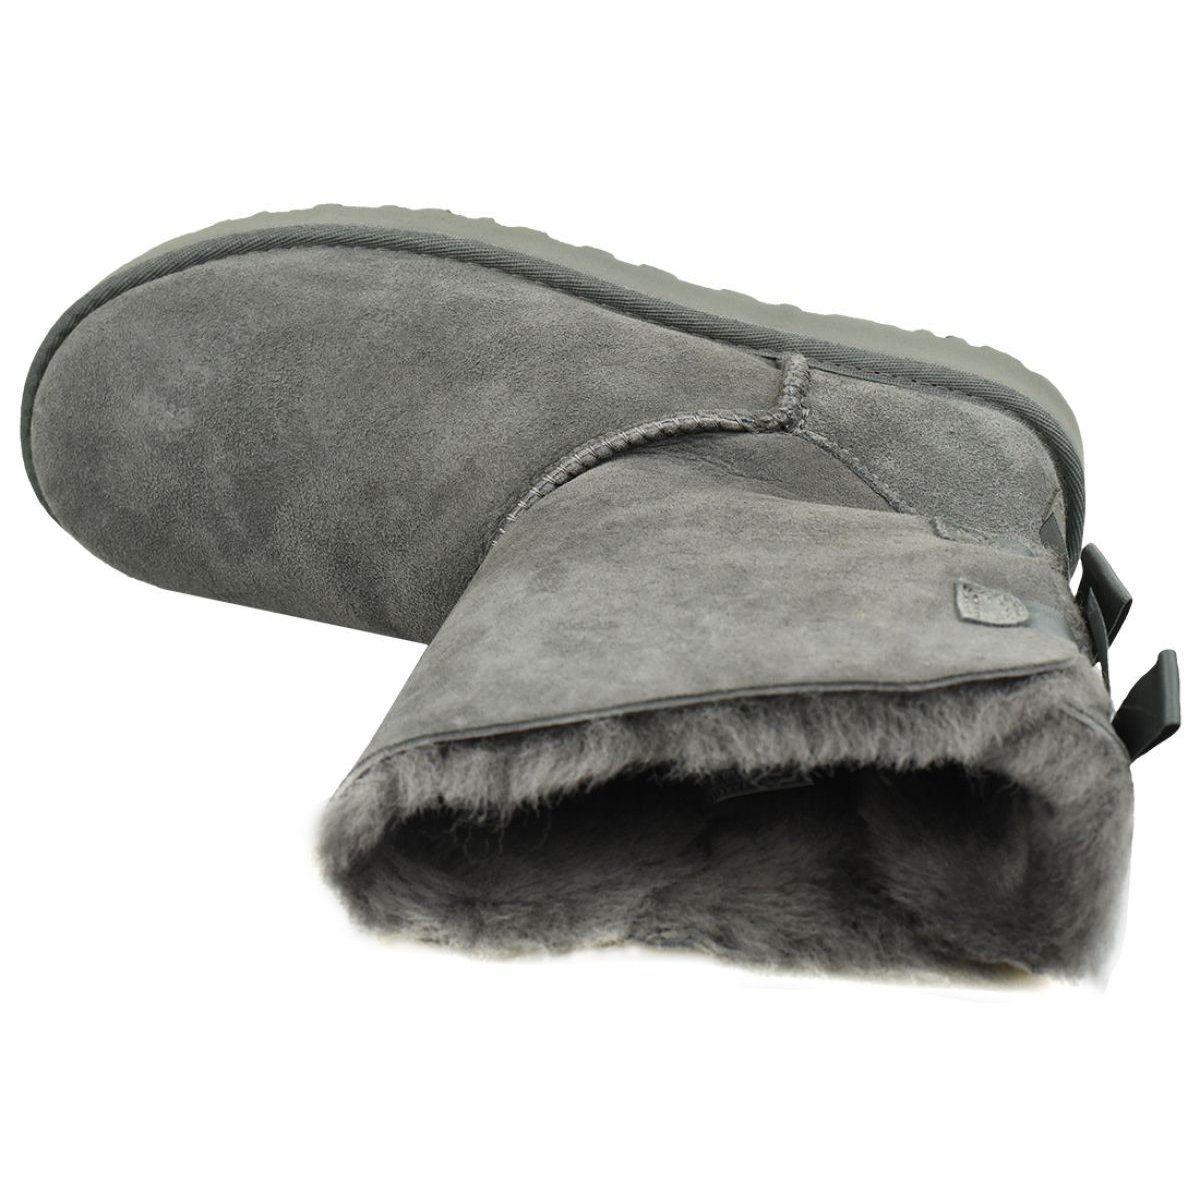 Sniegowce Z Wywijana Cholewka Szare Ugg Boots Boots Slide Slipper